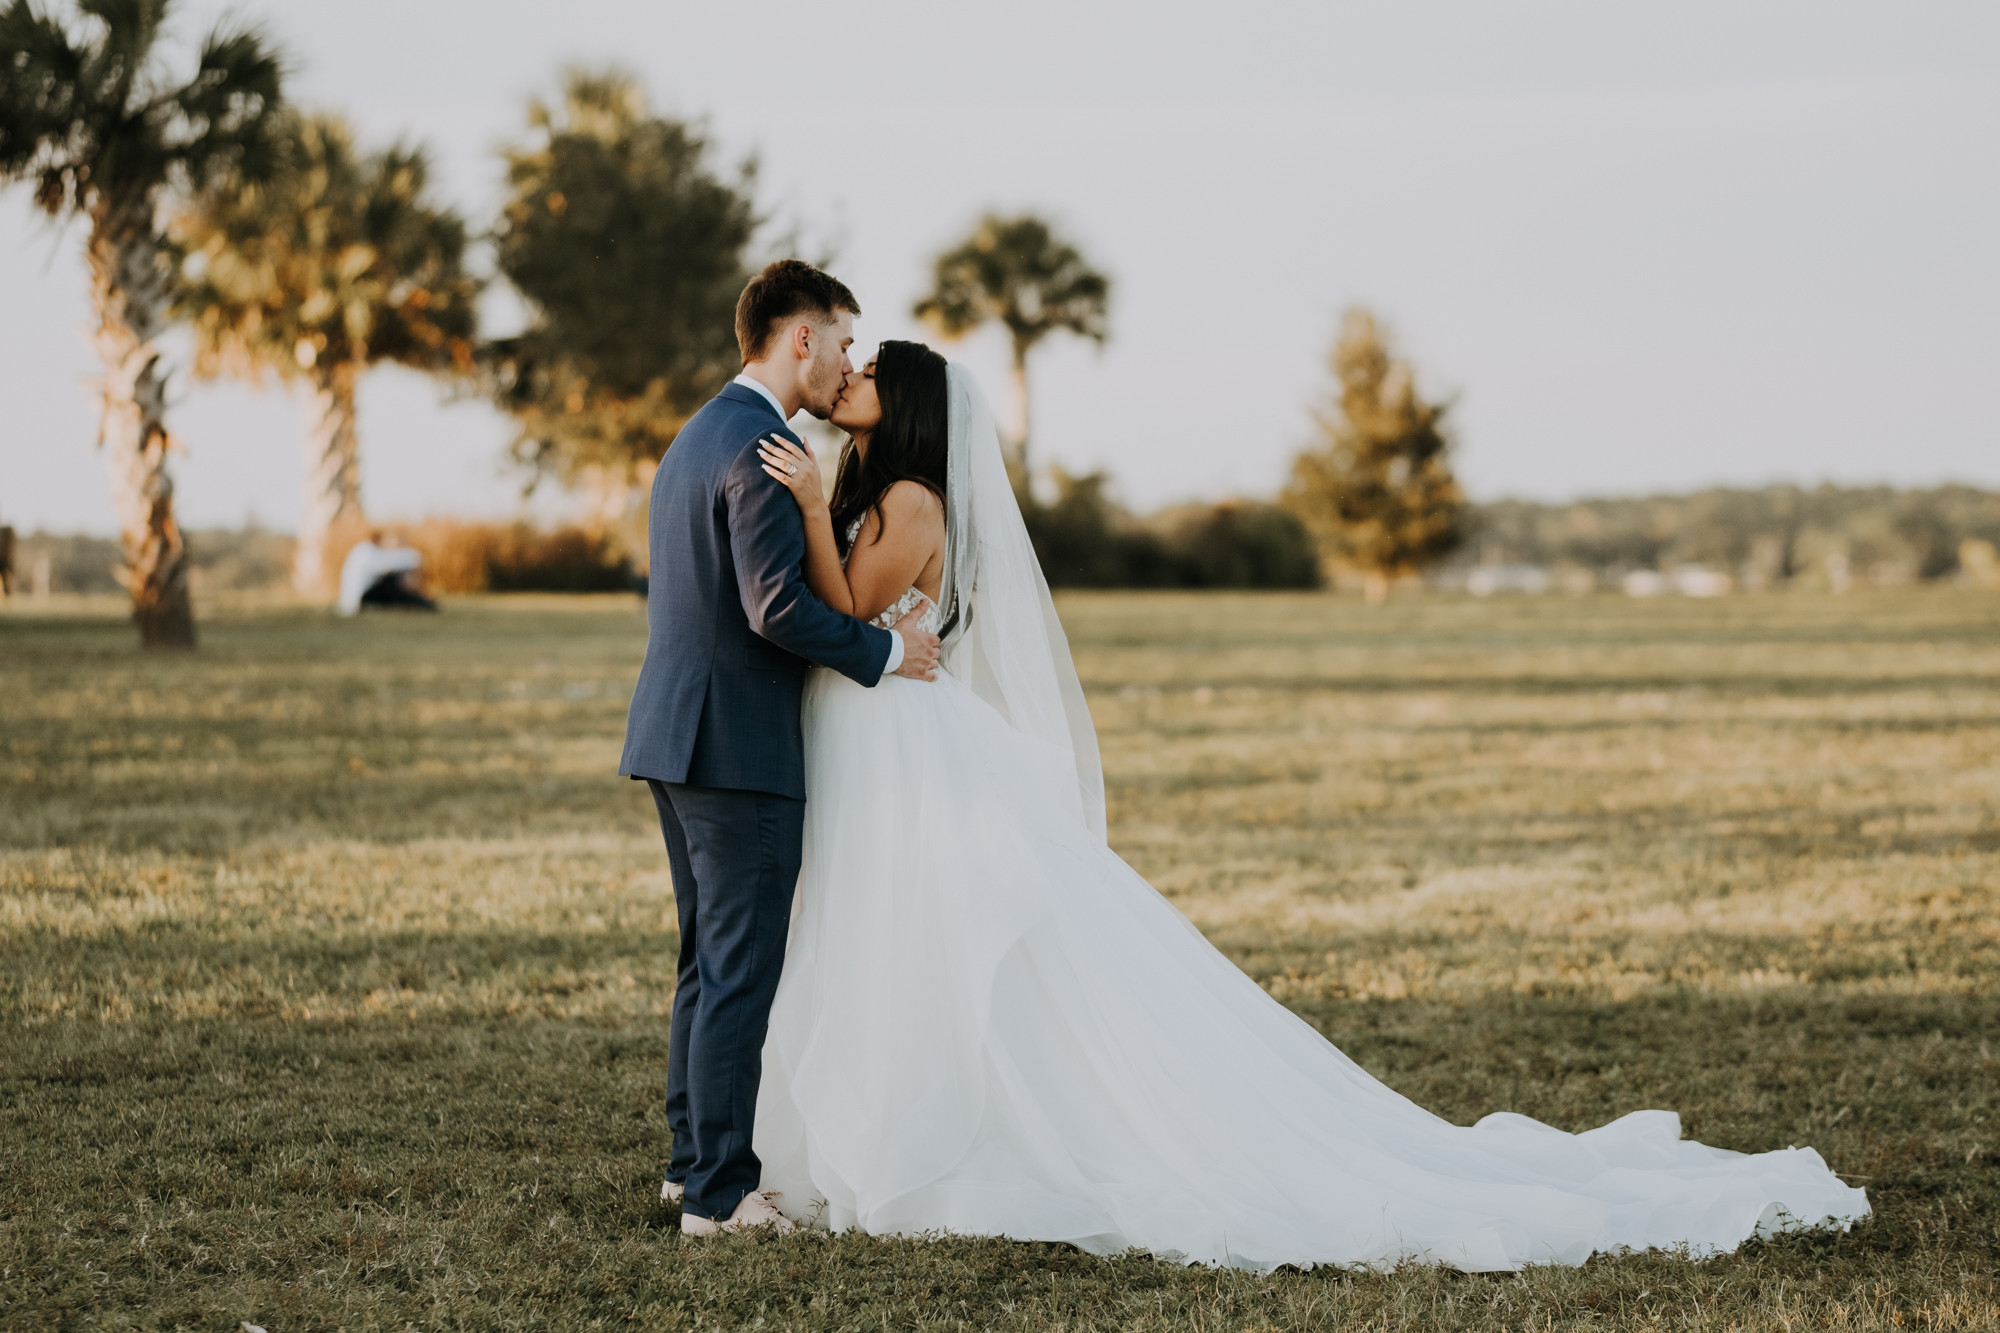 romantic bridal portraits | intimate wedding photos | romantic sarasota wedding | outdoor Florida wedding | boho wedding portraits